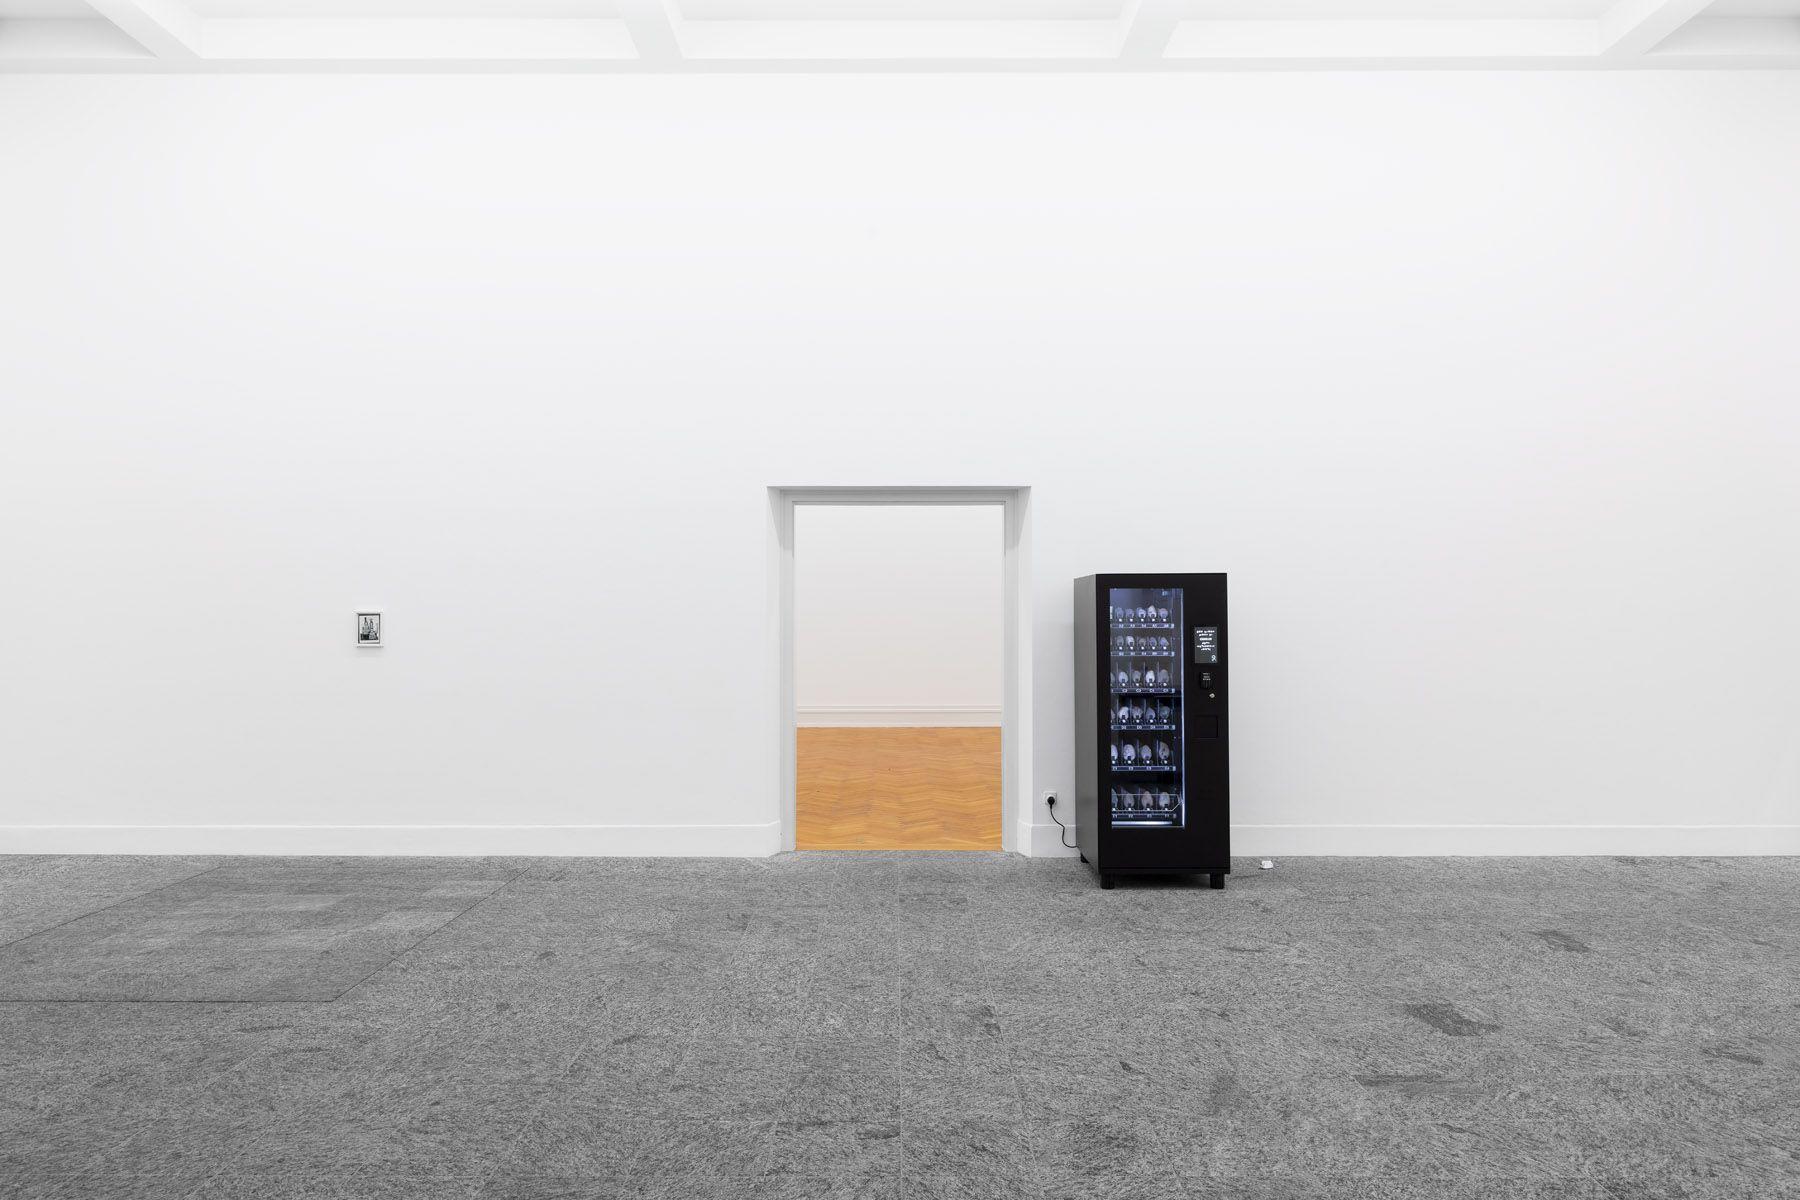 Kunsthalle Bern Artlisting